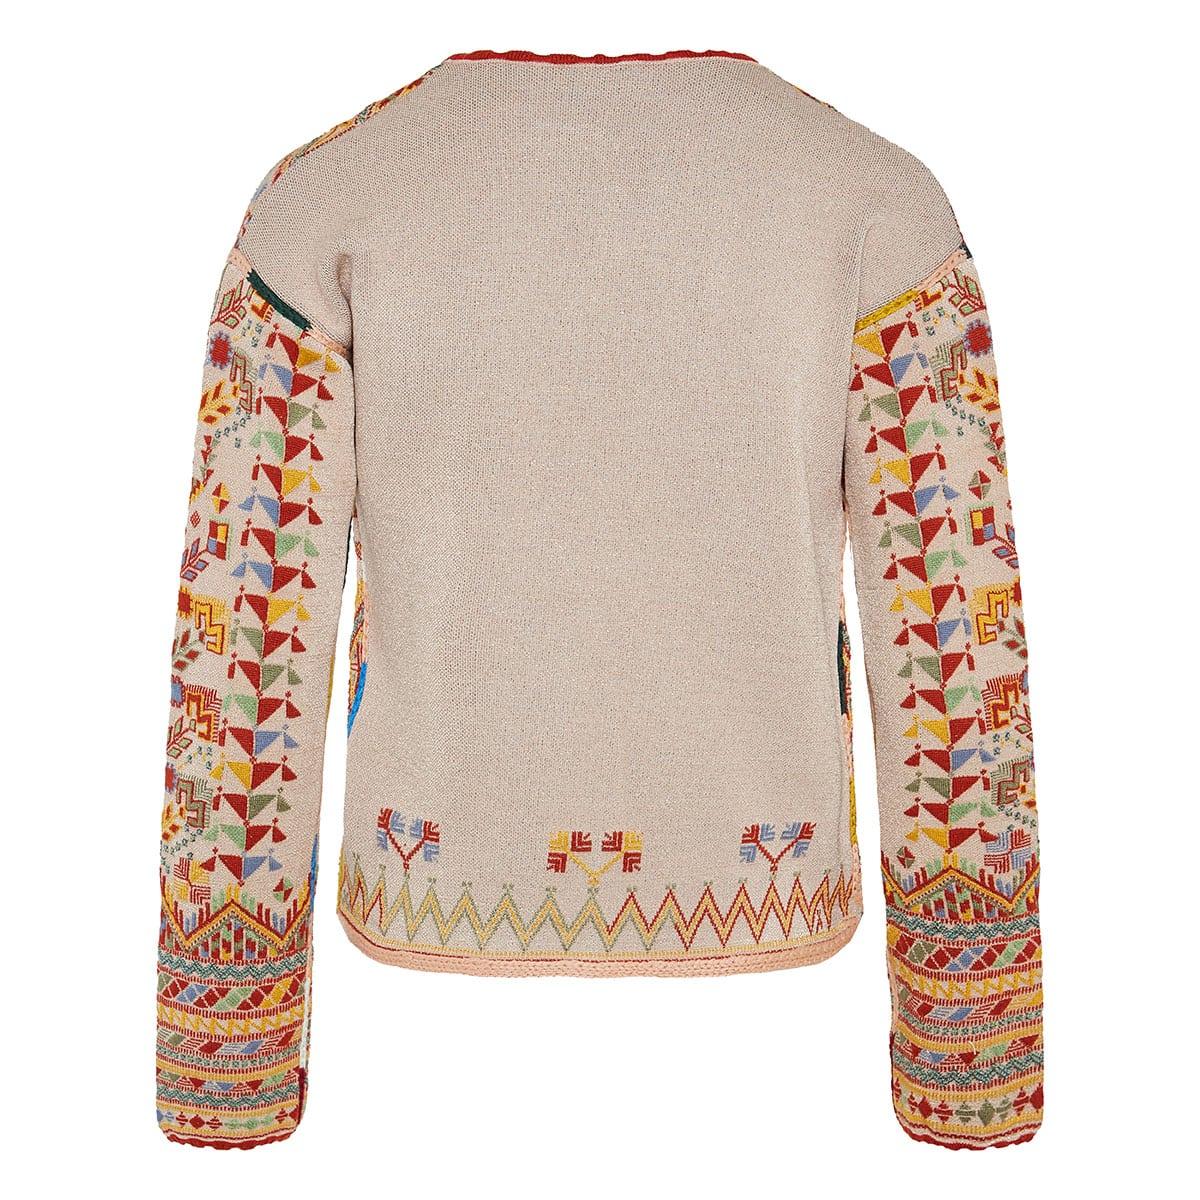 Ethnic print jacquard knitted jacket